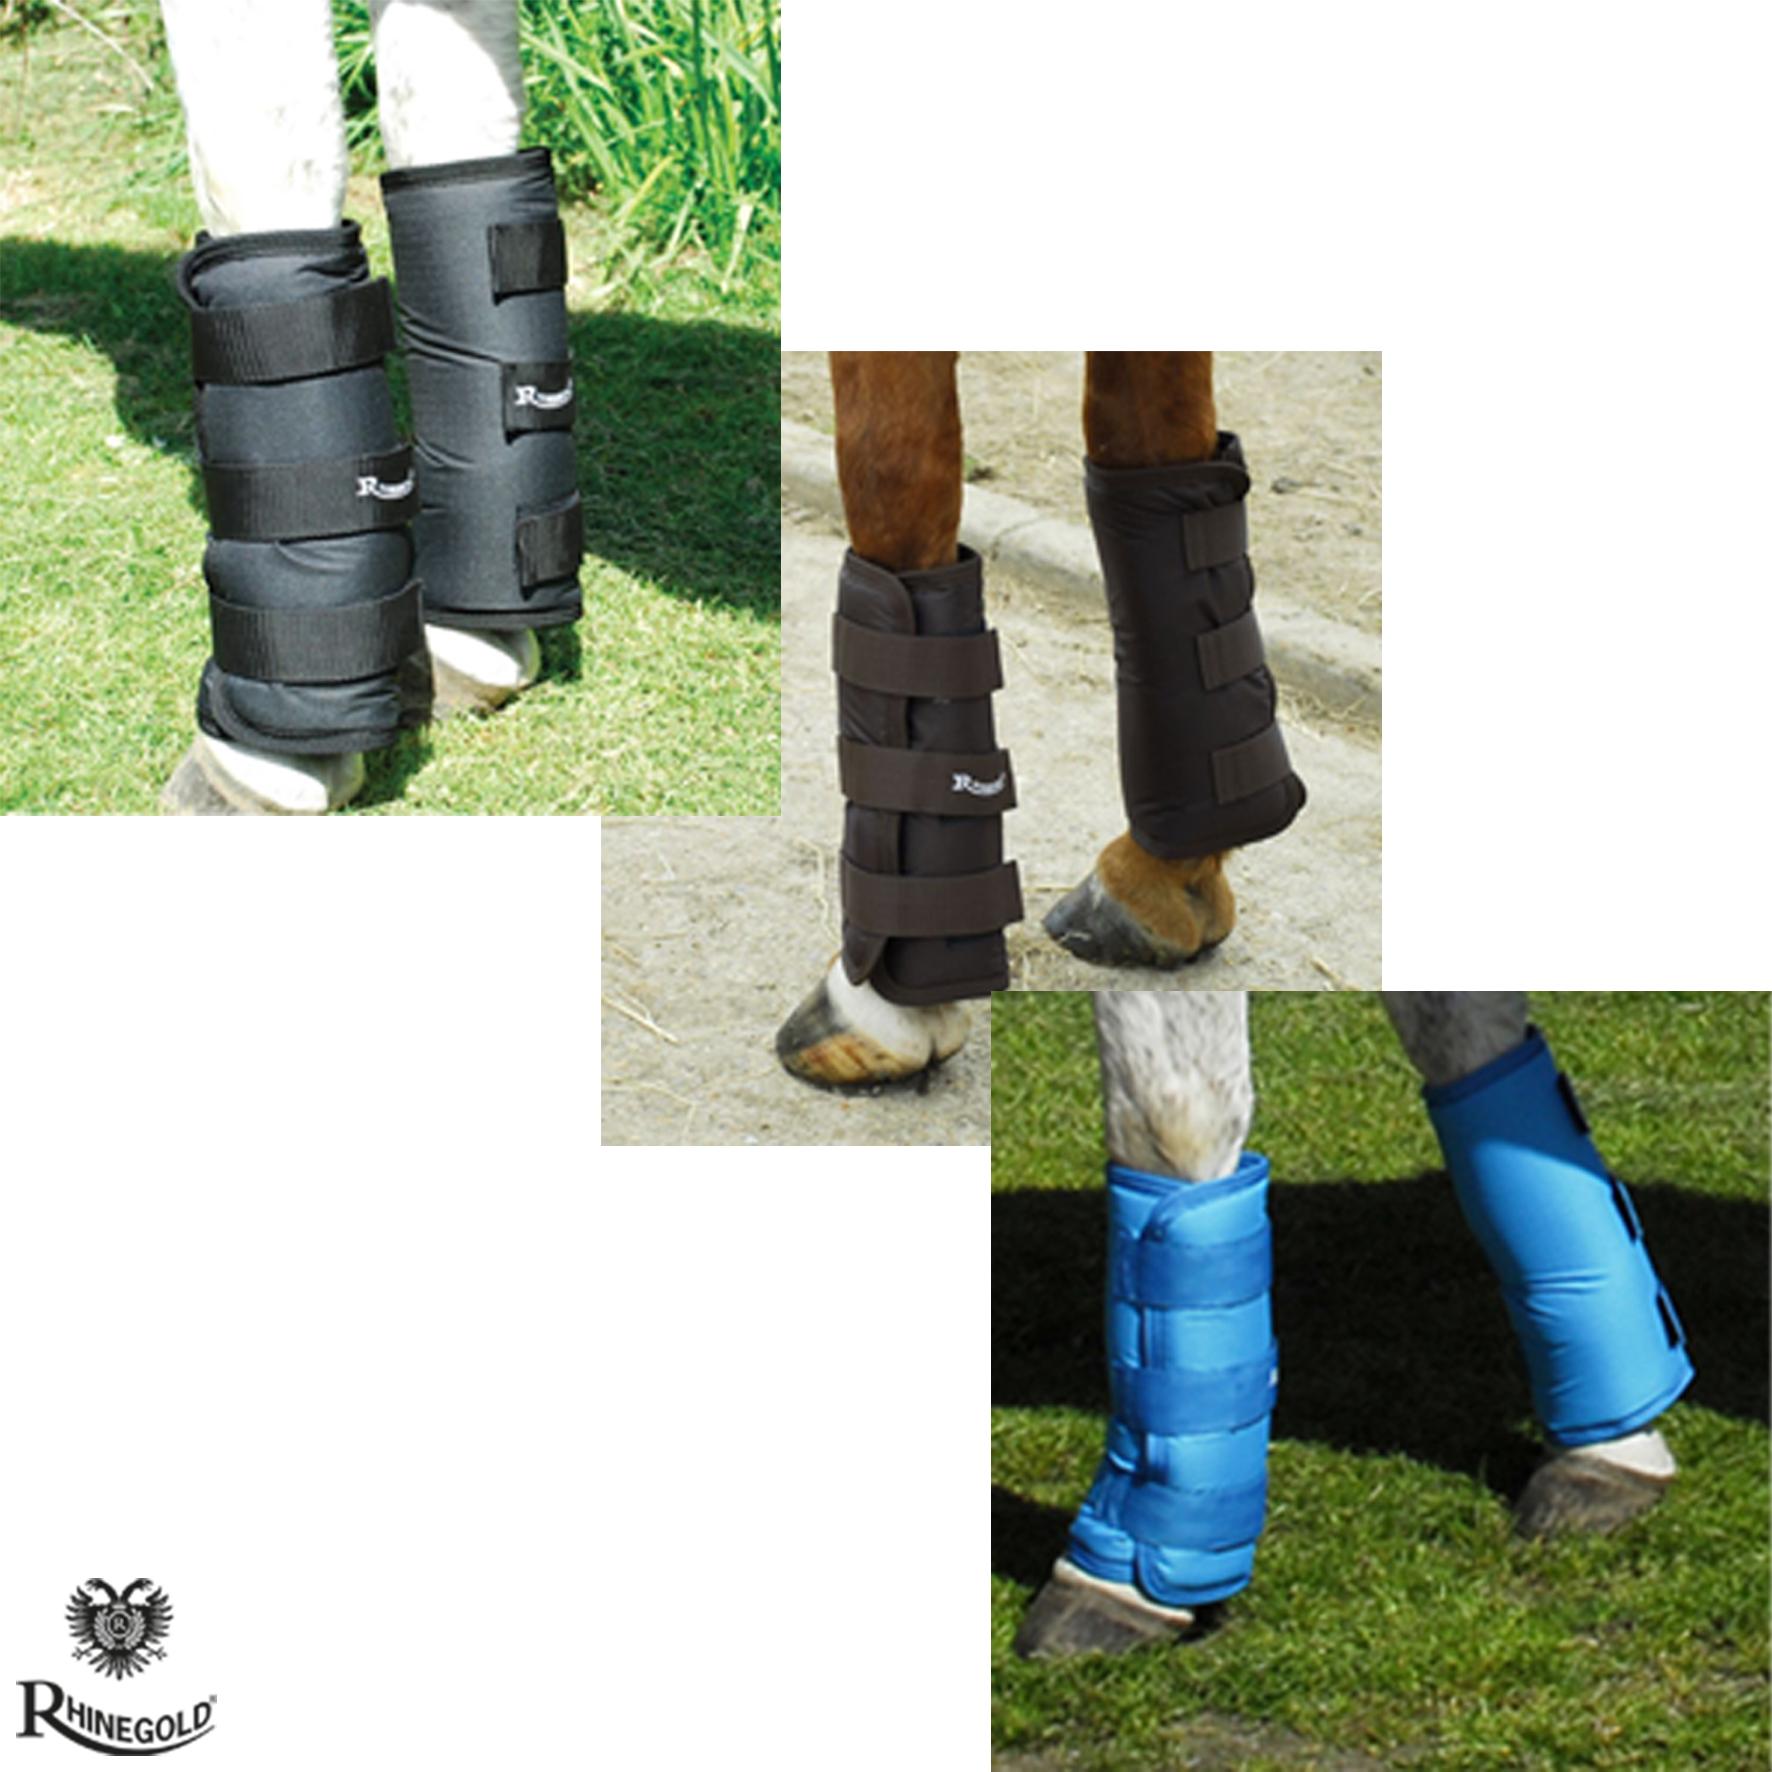 Rhinegold Elite Travel Boots